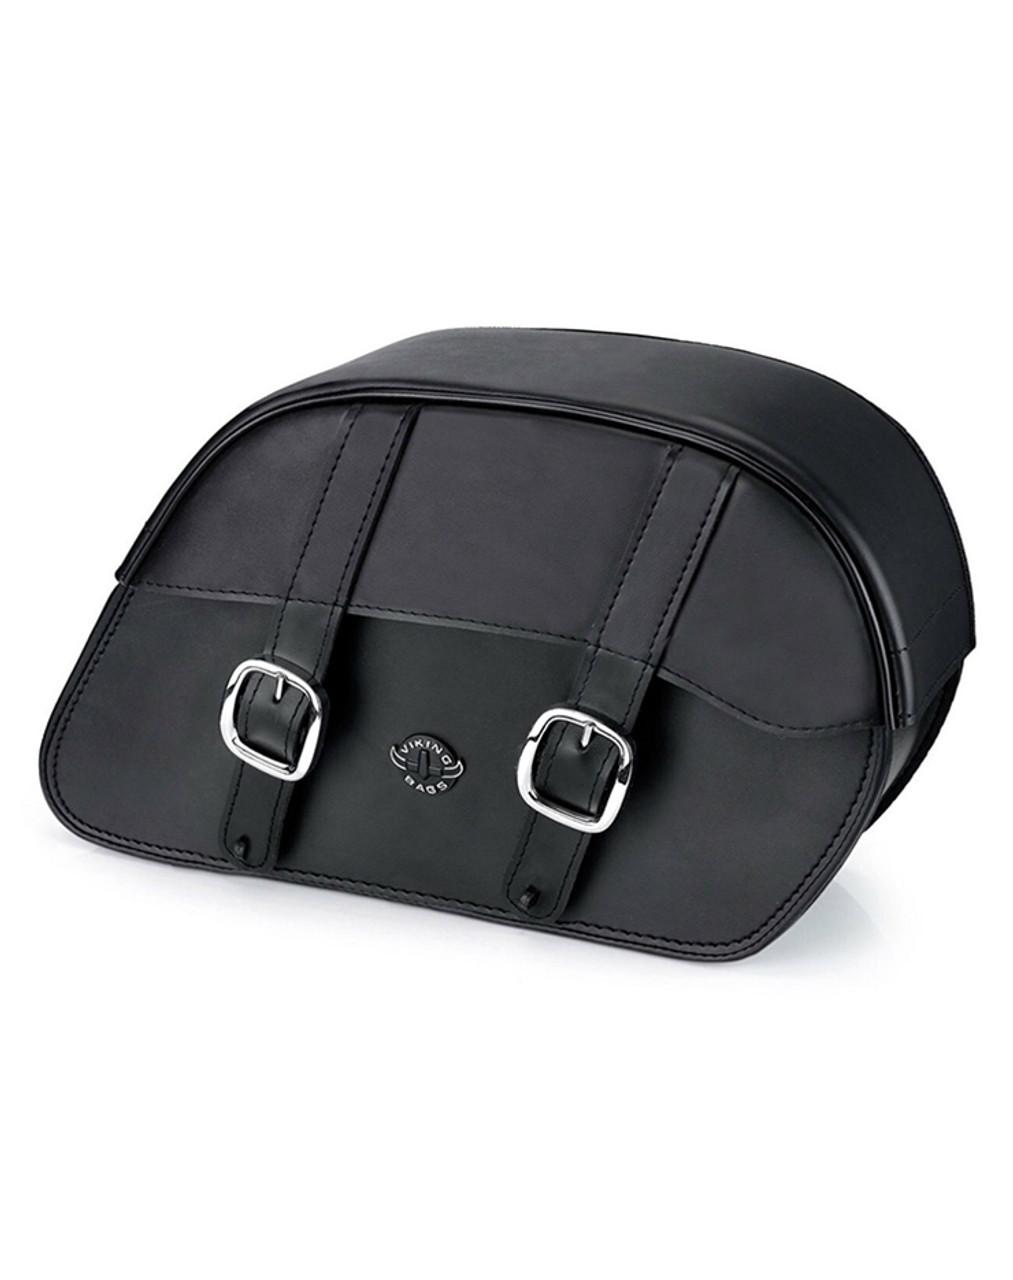 VikingBags Vital Large Padlock Double Strap Leather Motorcycle Saddlebags Main Bag View